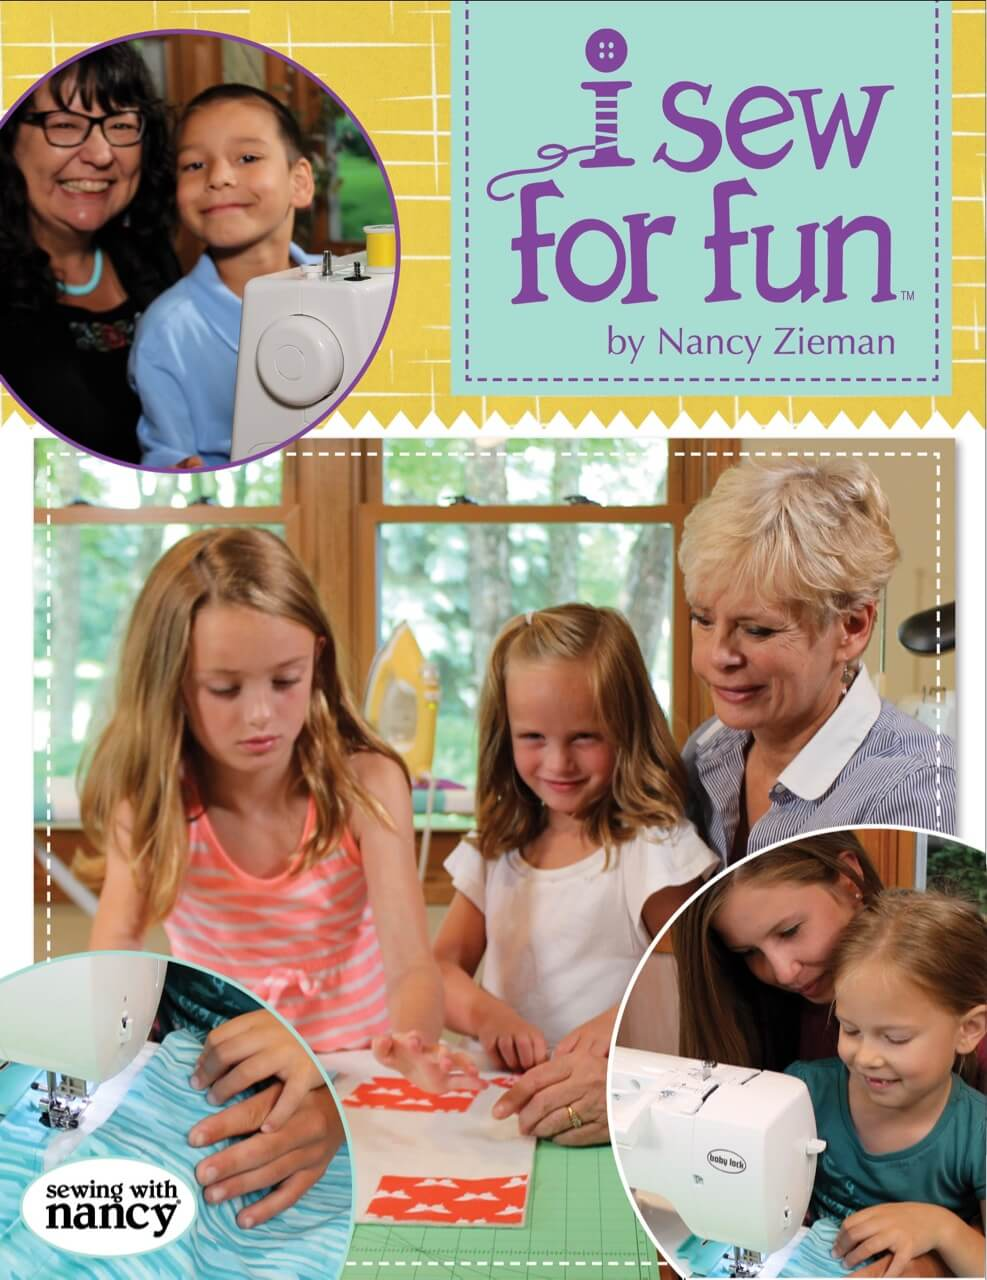 Nancy Zieman's I Sew For Fun